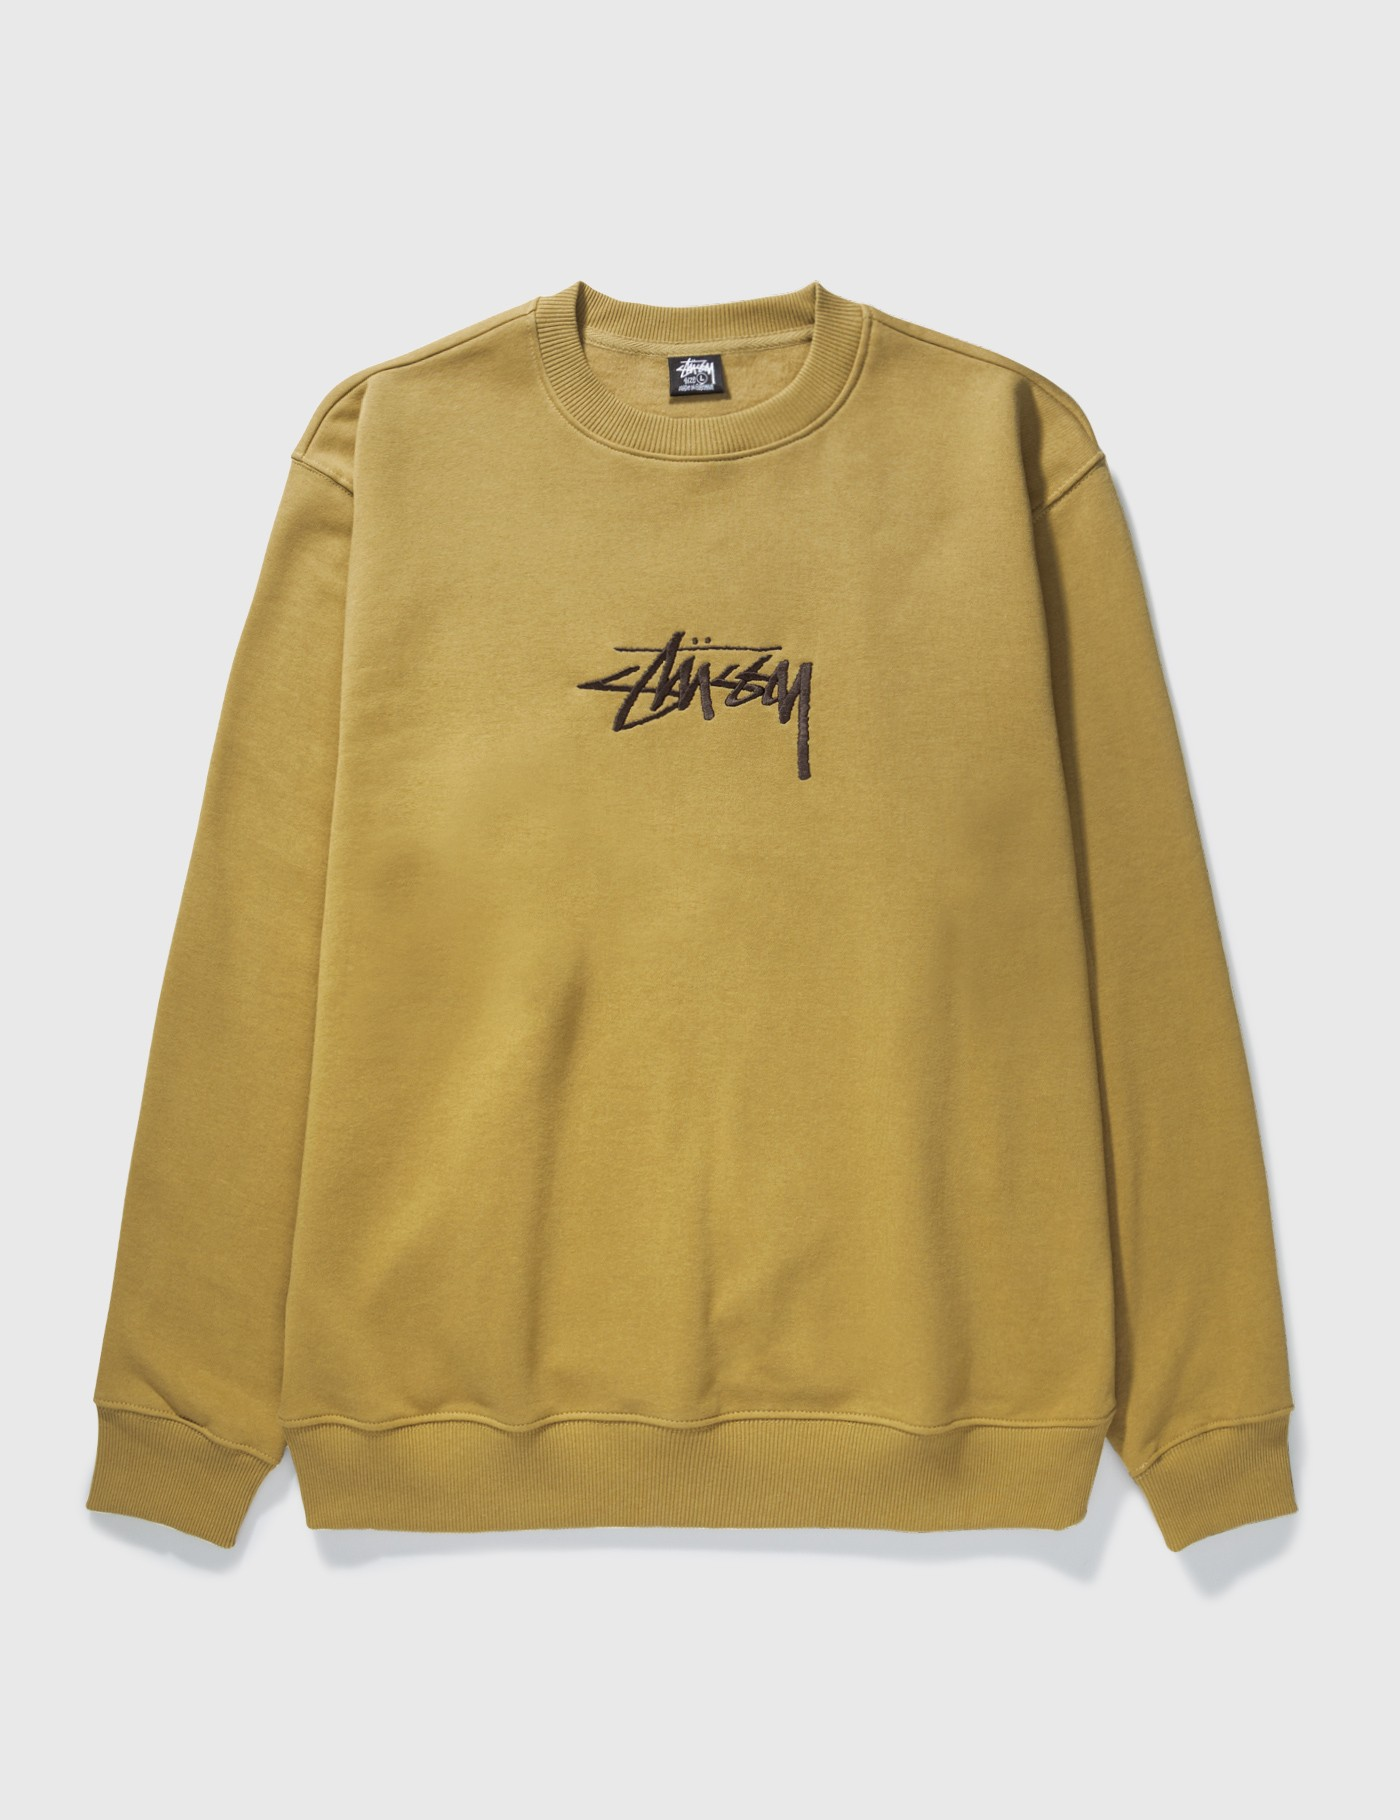 Stussy Sweaters STOCK APP. SWEATSHIRT